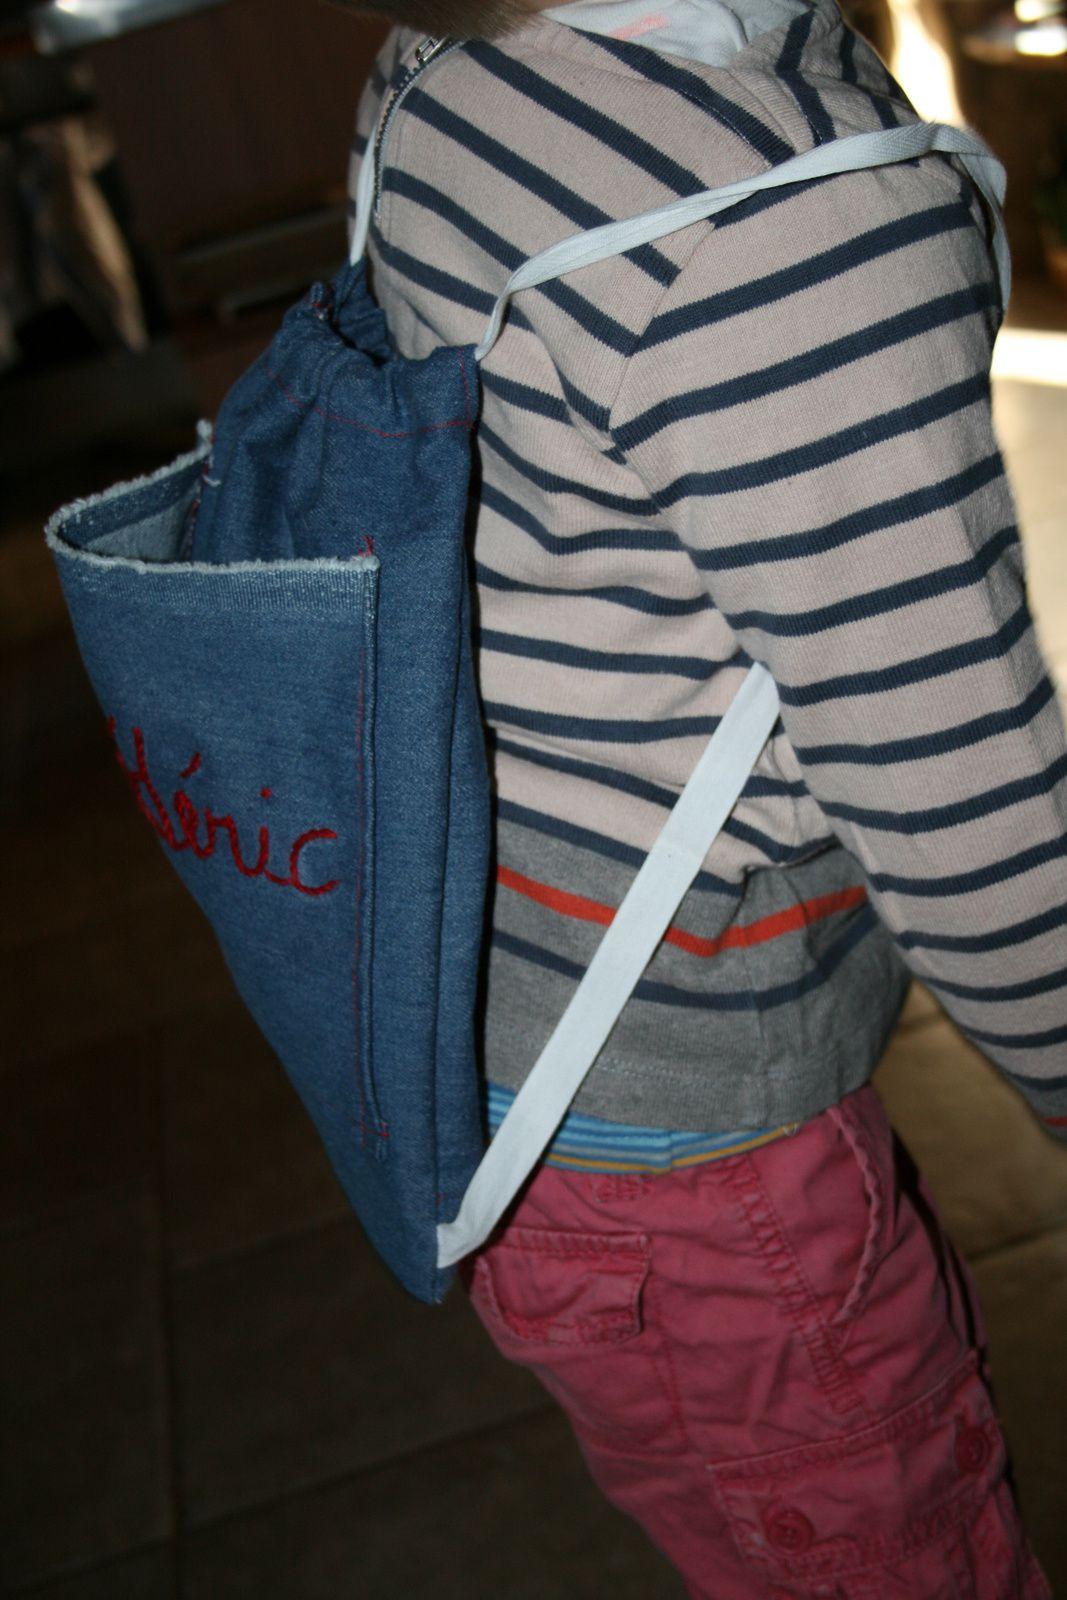 diy sac a dos enfant avec broderie, charlotteblabla blog